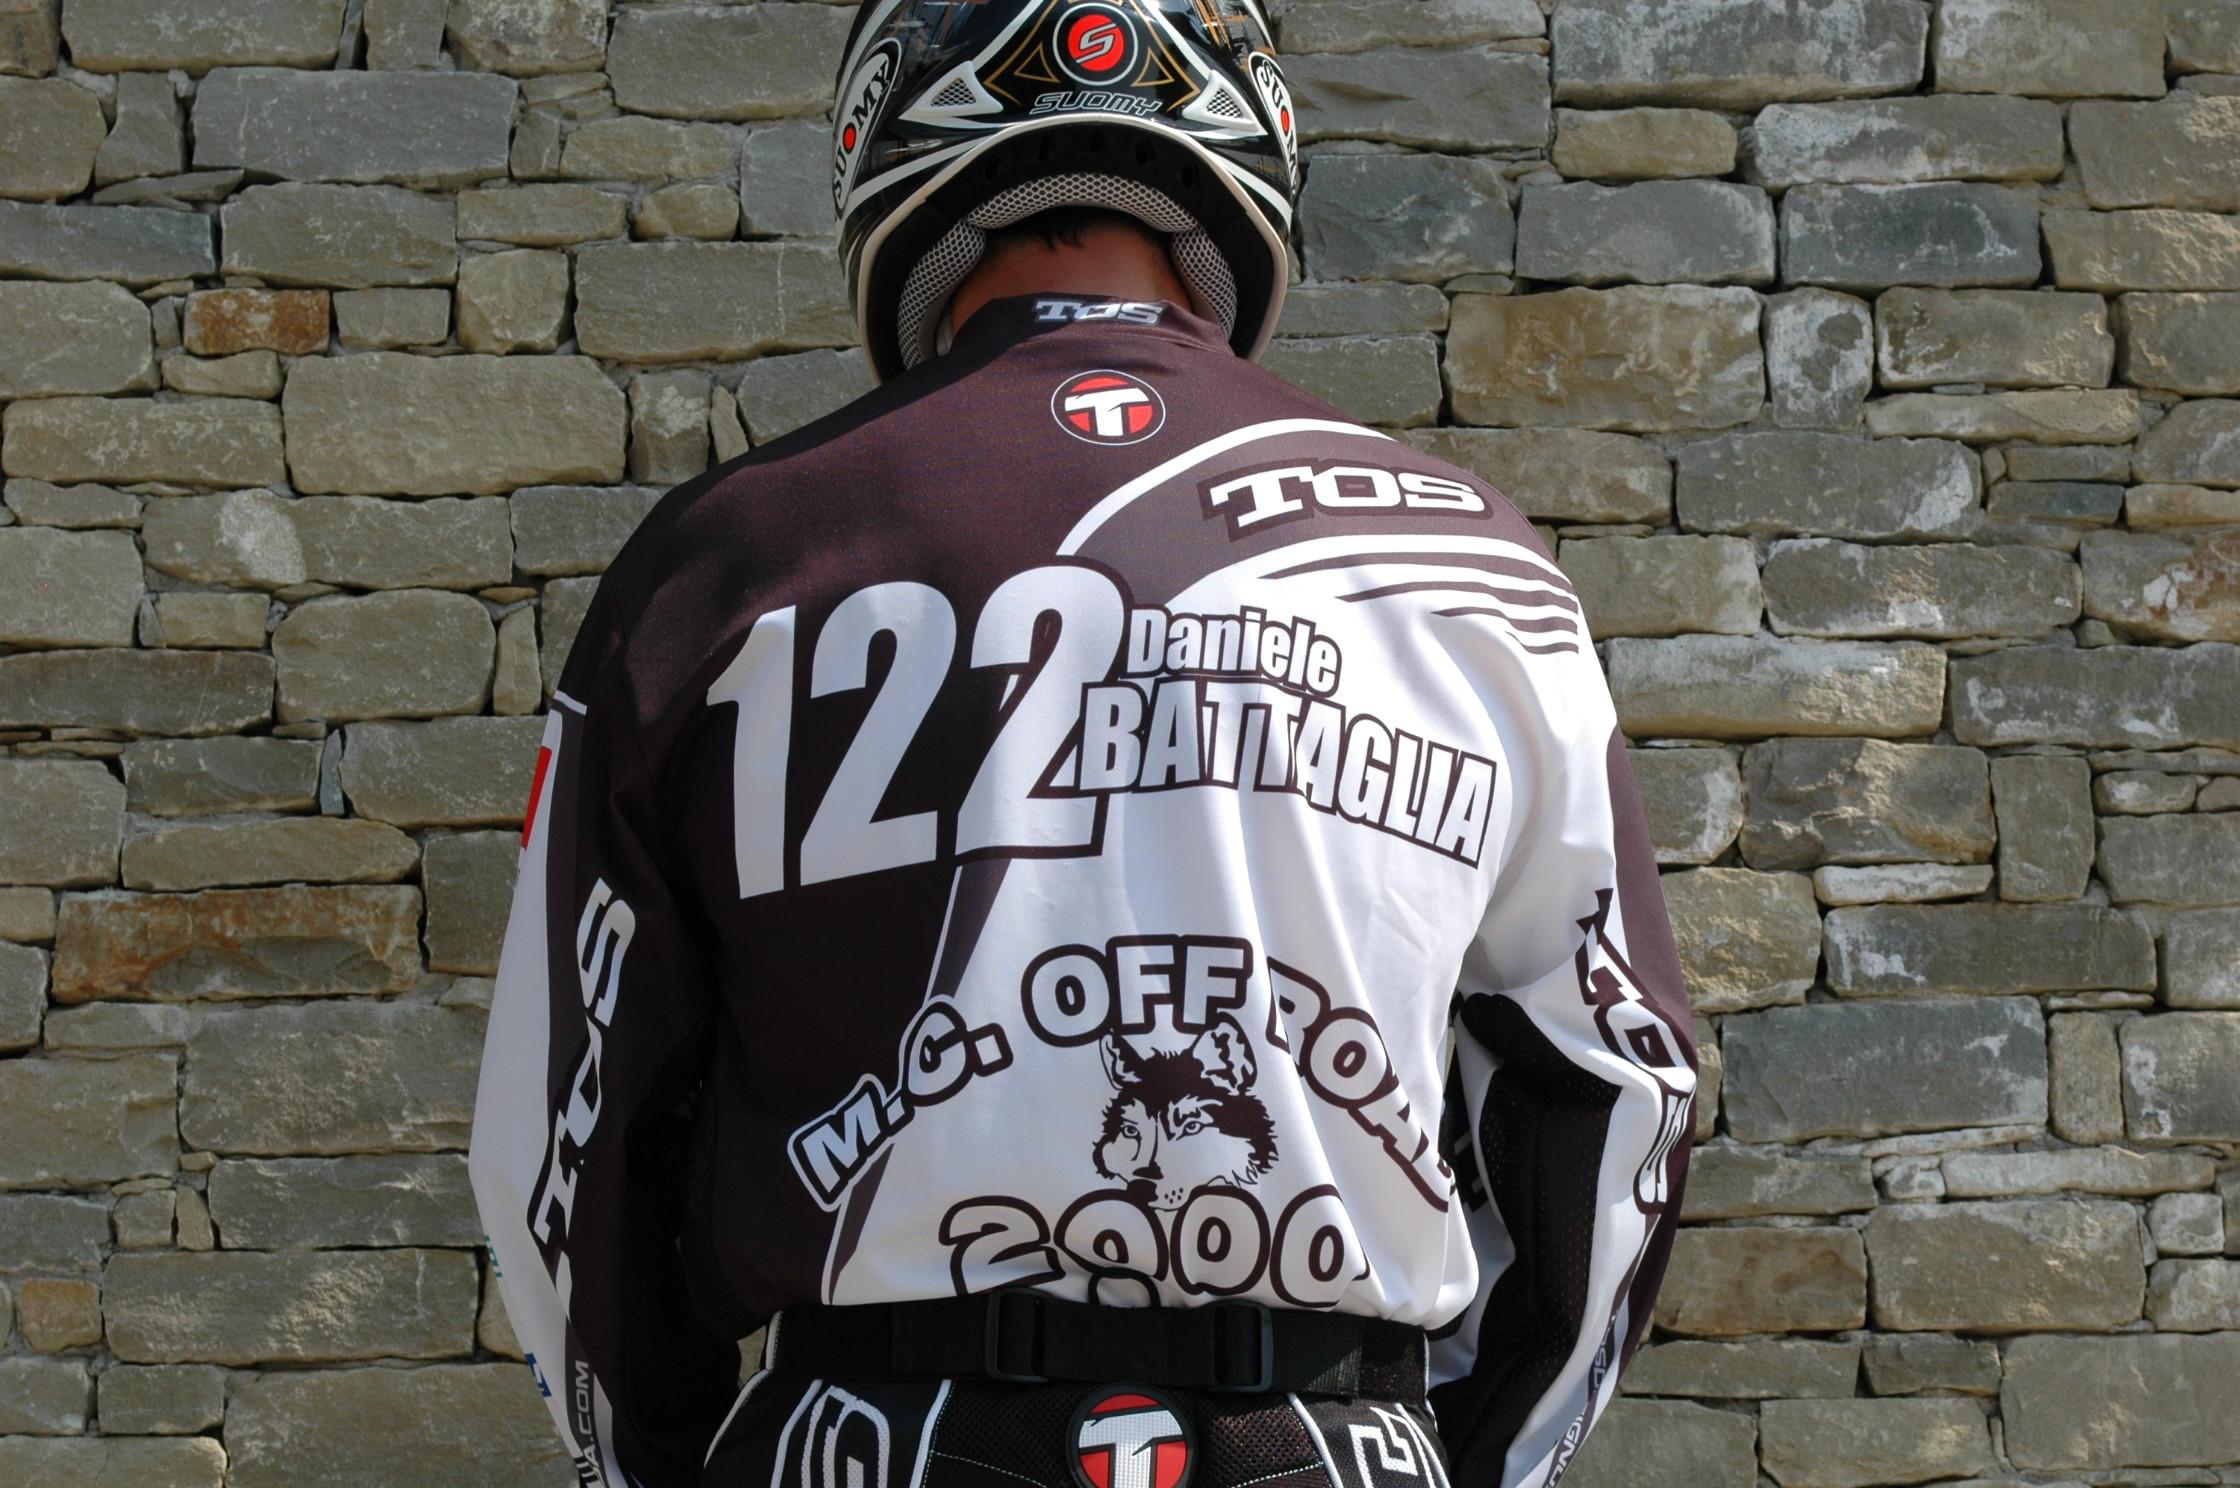 divisa-off-road-2000 (16)